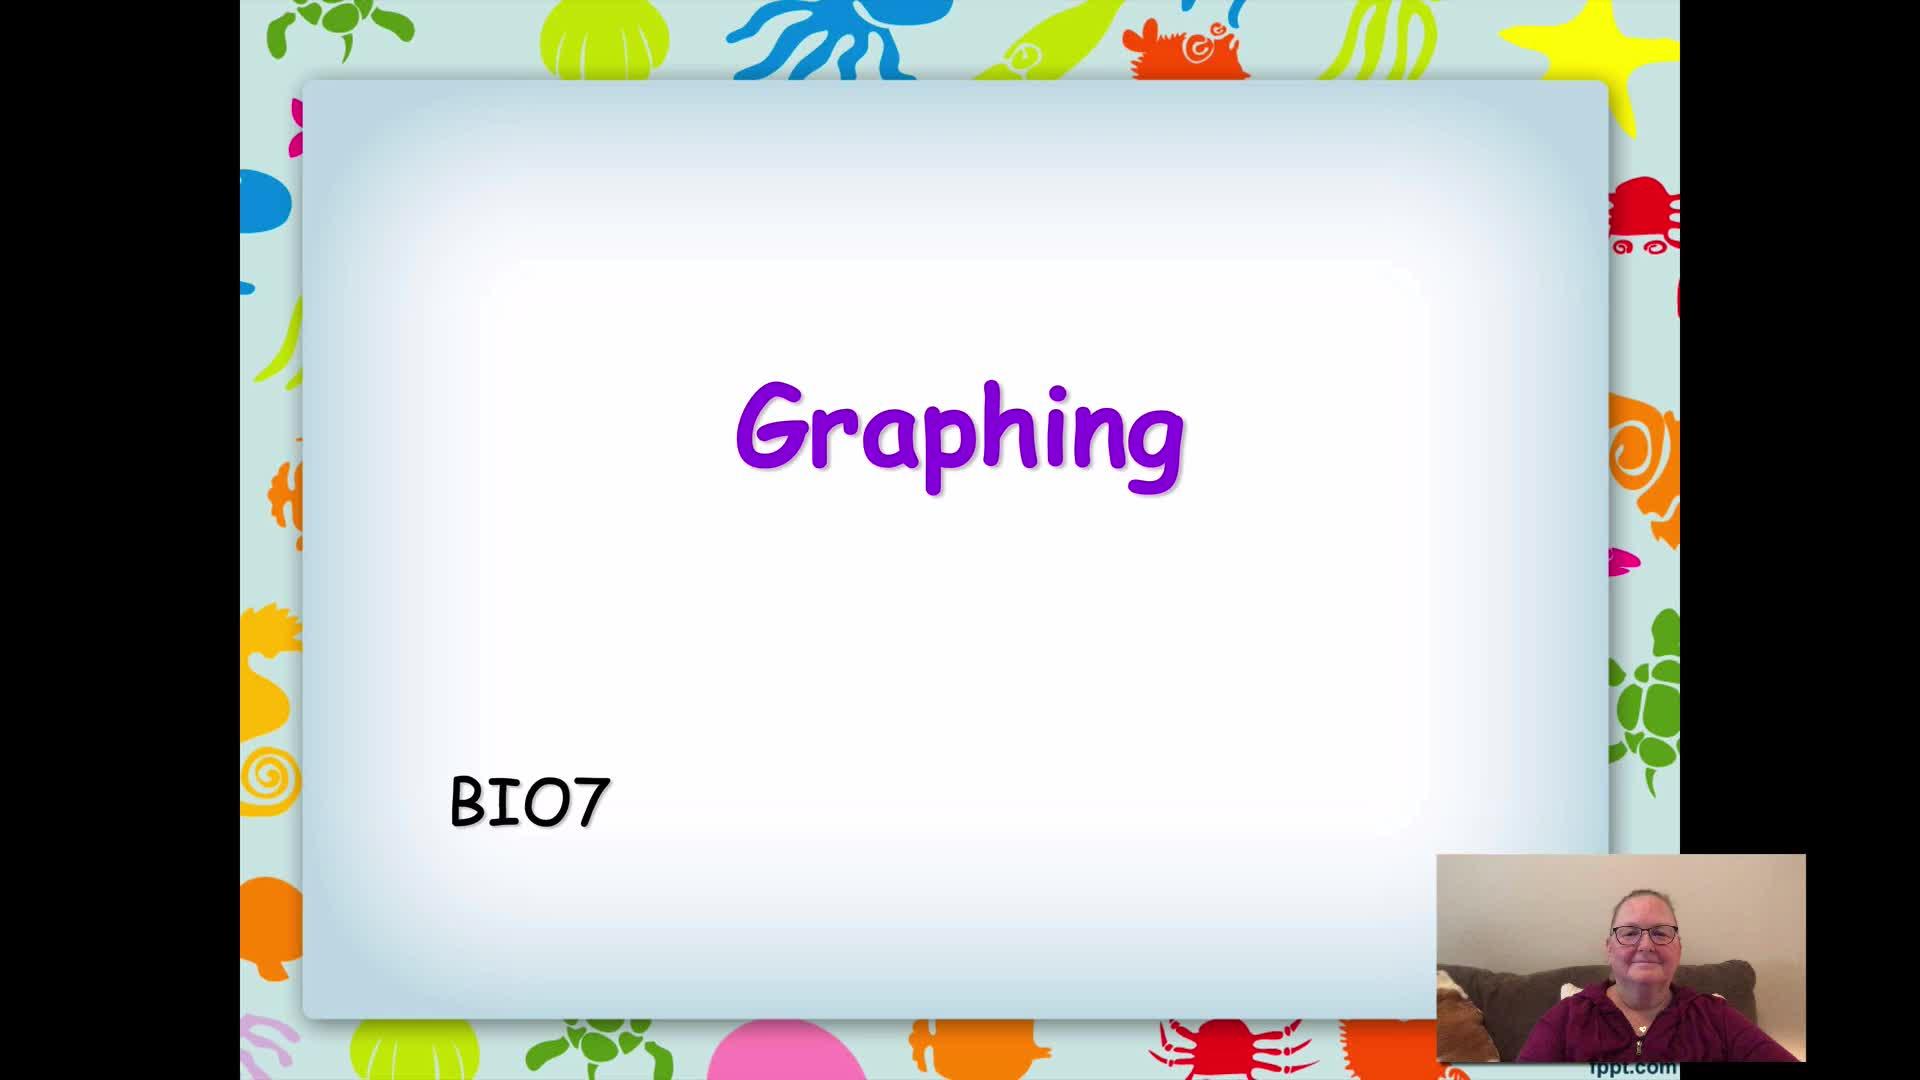 BIO7 - Graphing